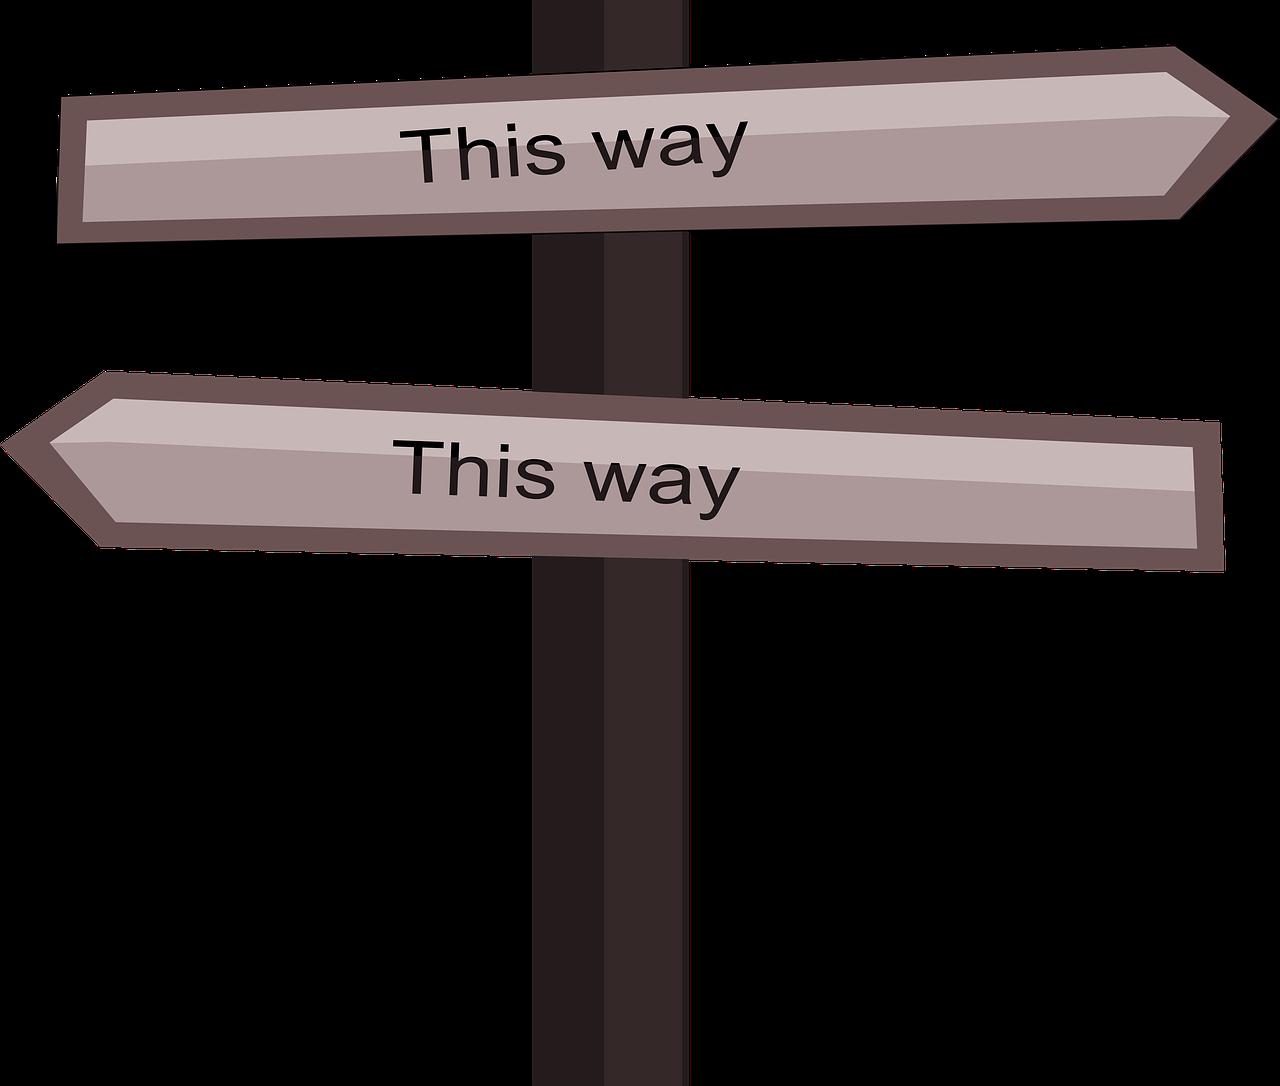 this-way-718660_1280.png